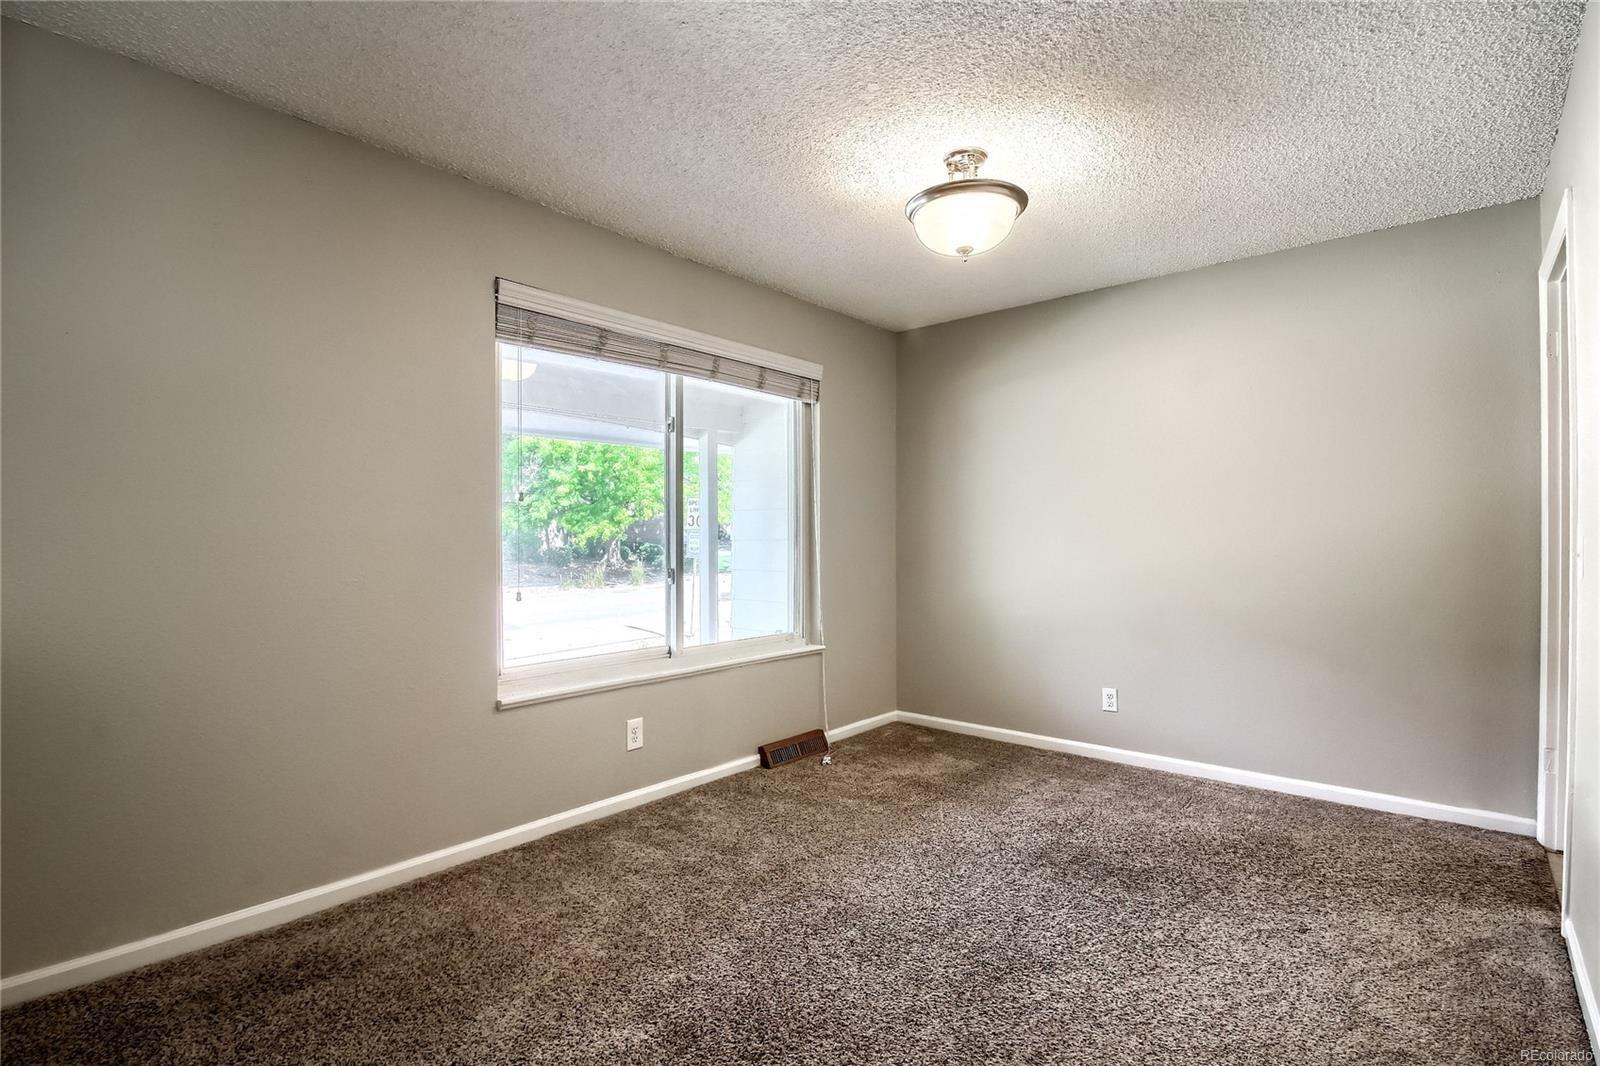 MLS# 7738774 - 5 - 8216 Lamar Drive, Arvada, CO 80003